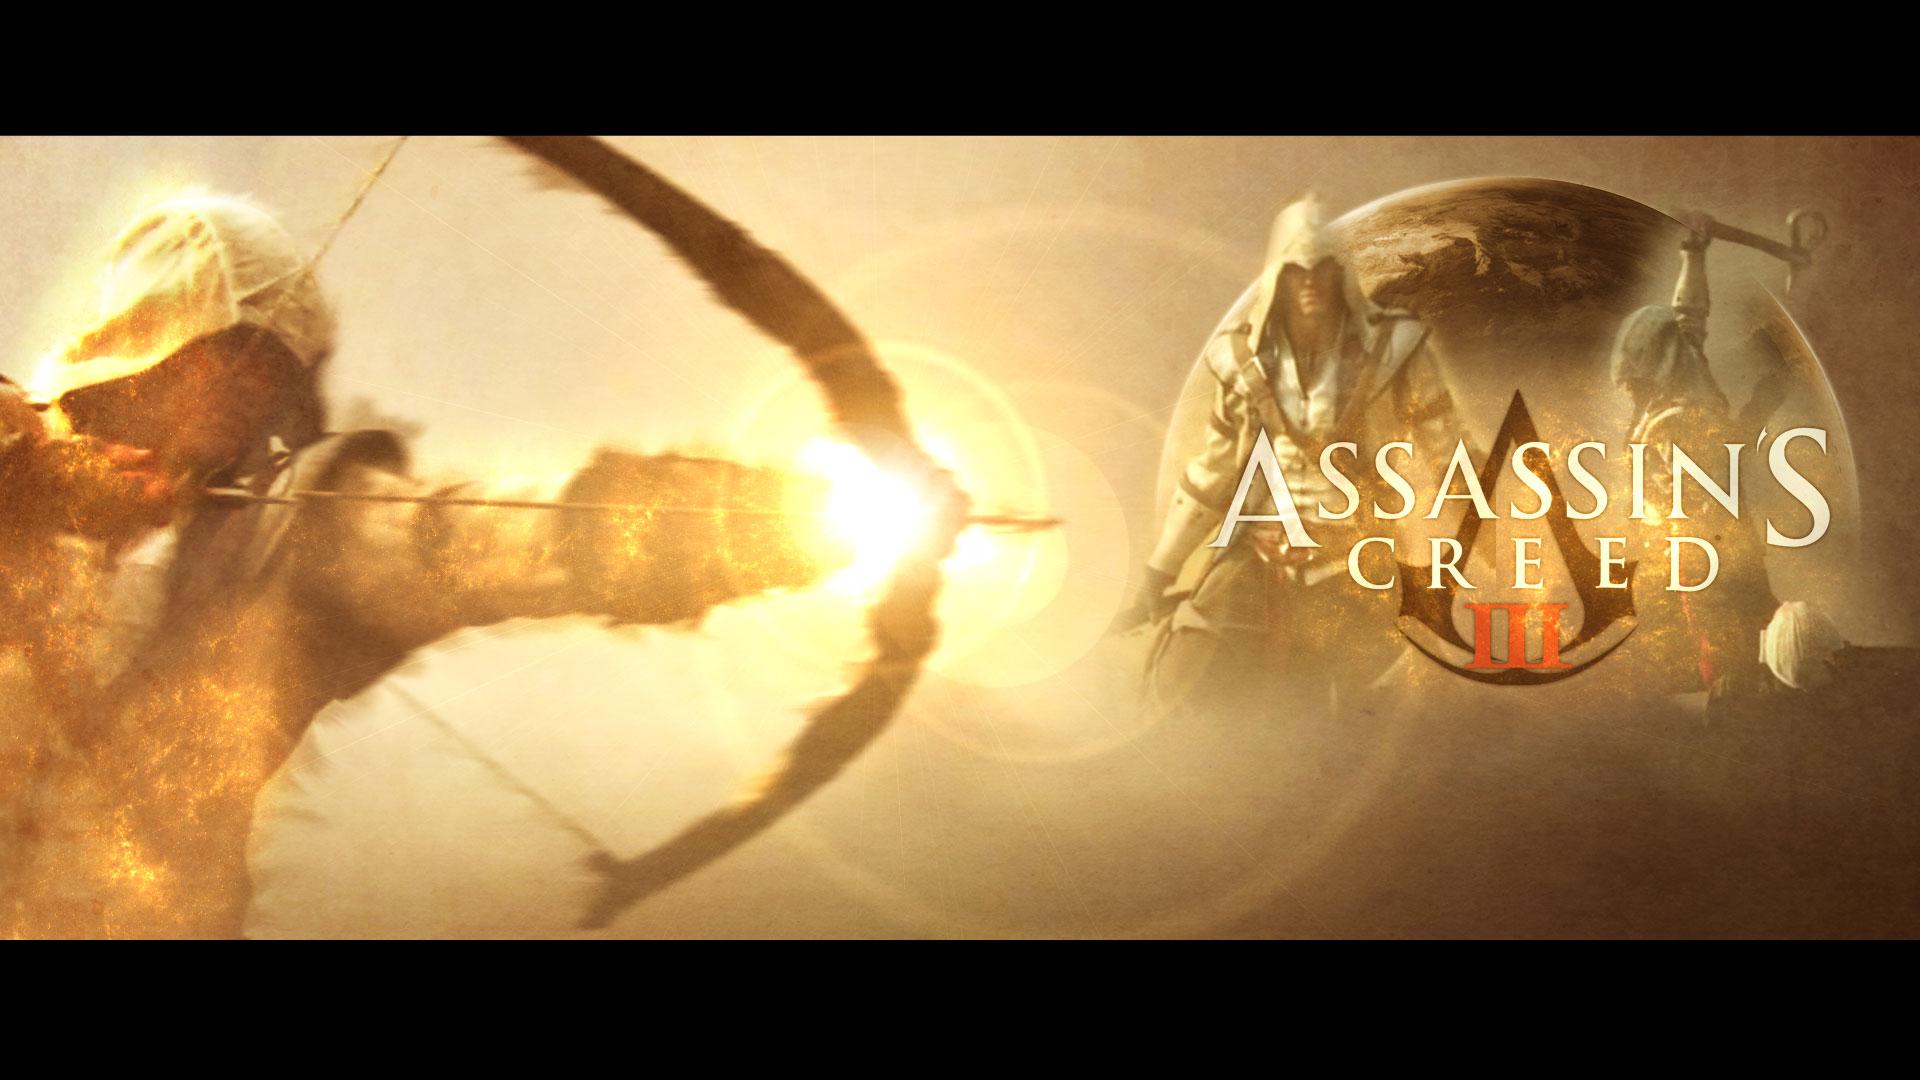 Wallpaper Assassin's Creed 3. by ekzan